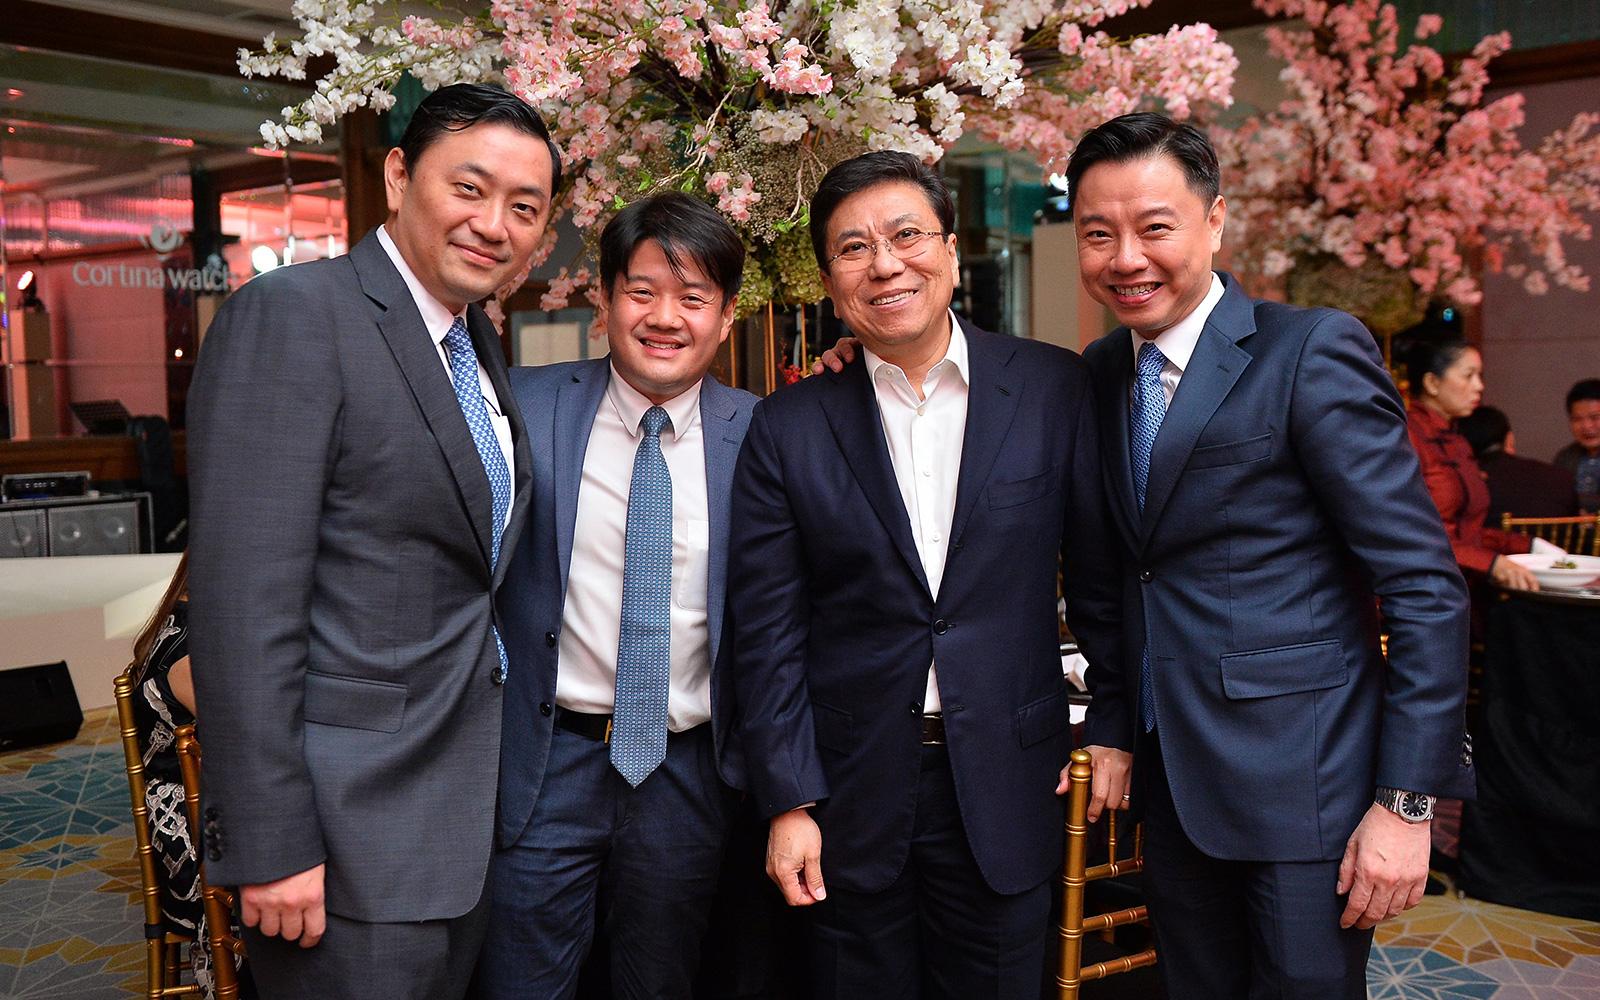 Dato Sri Robin Tan, Dato Douglas Cheng, Datuk KC Yeow and Tay Liam Khoon